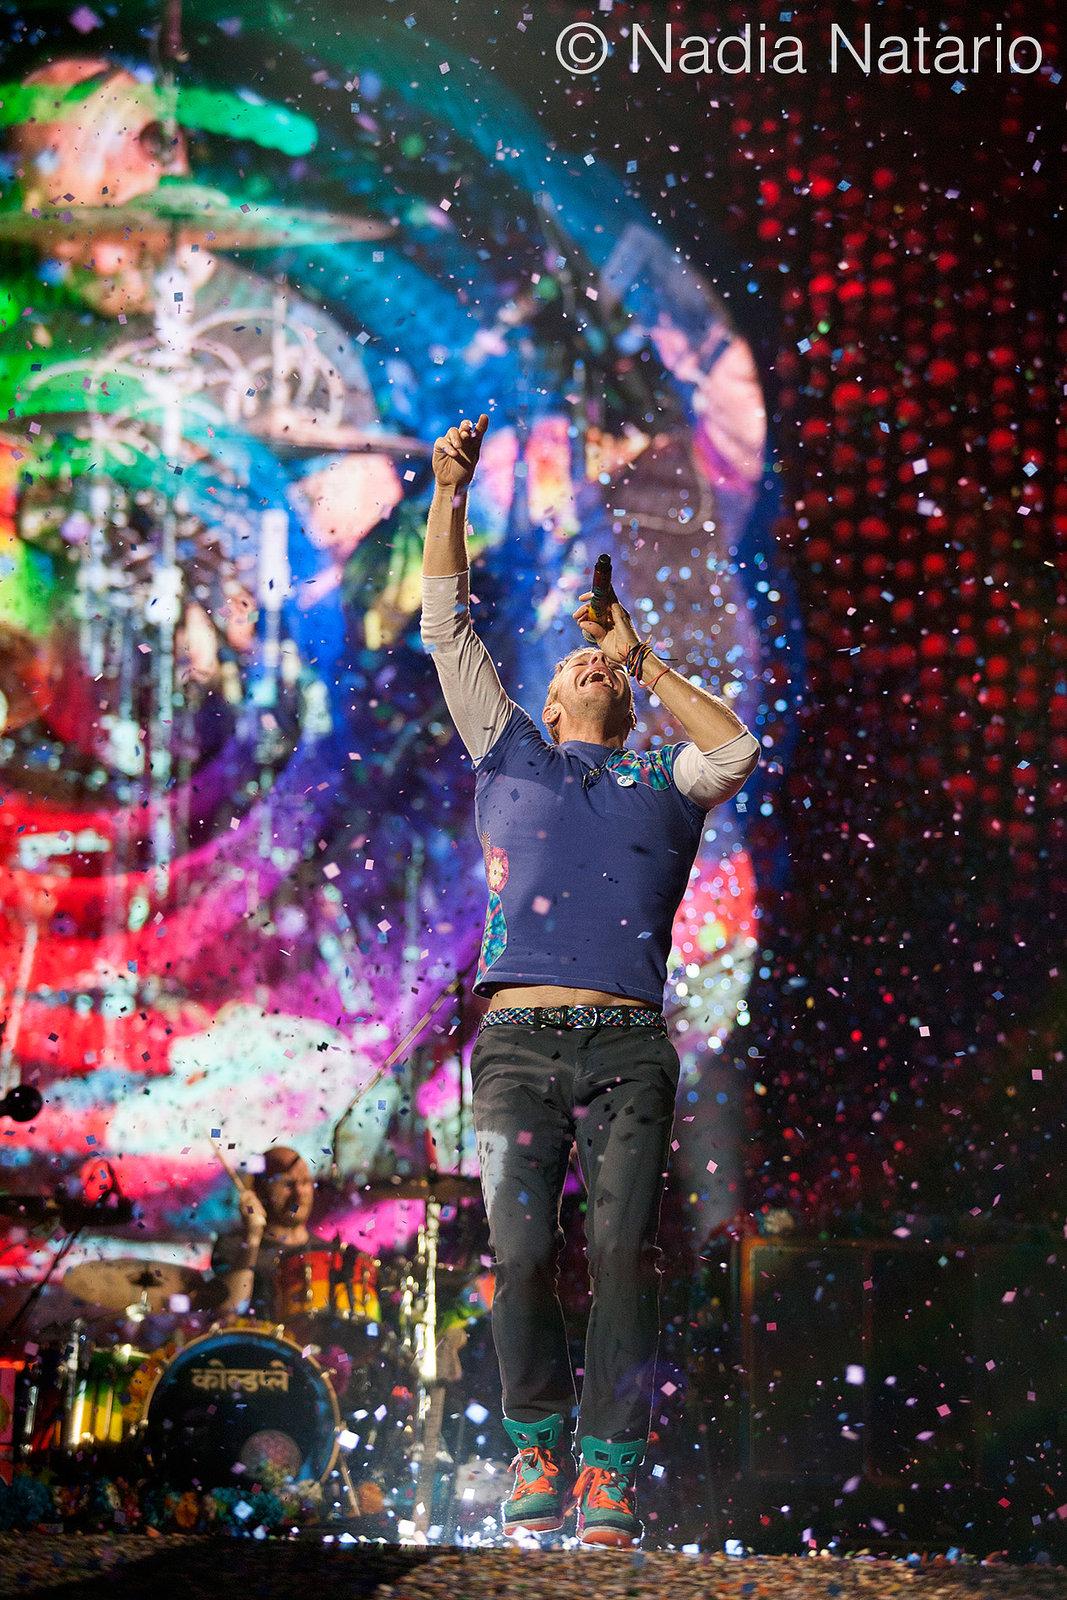 Coldplay at Olimpic Stadium